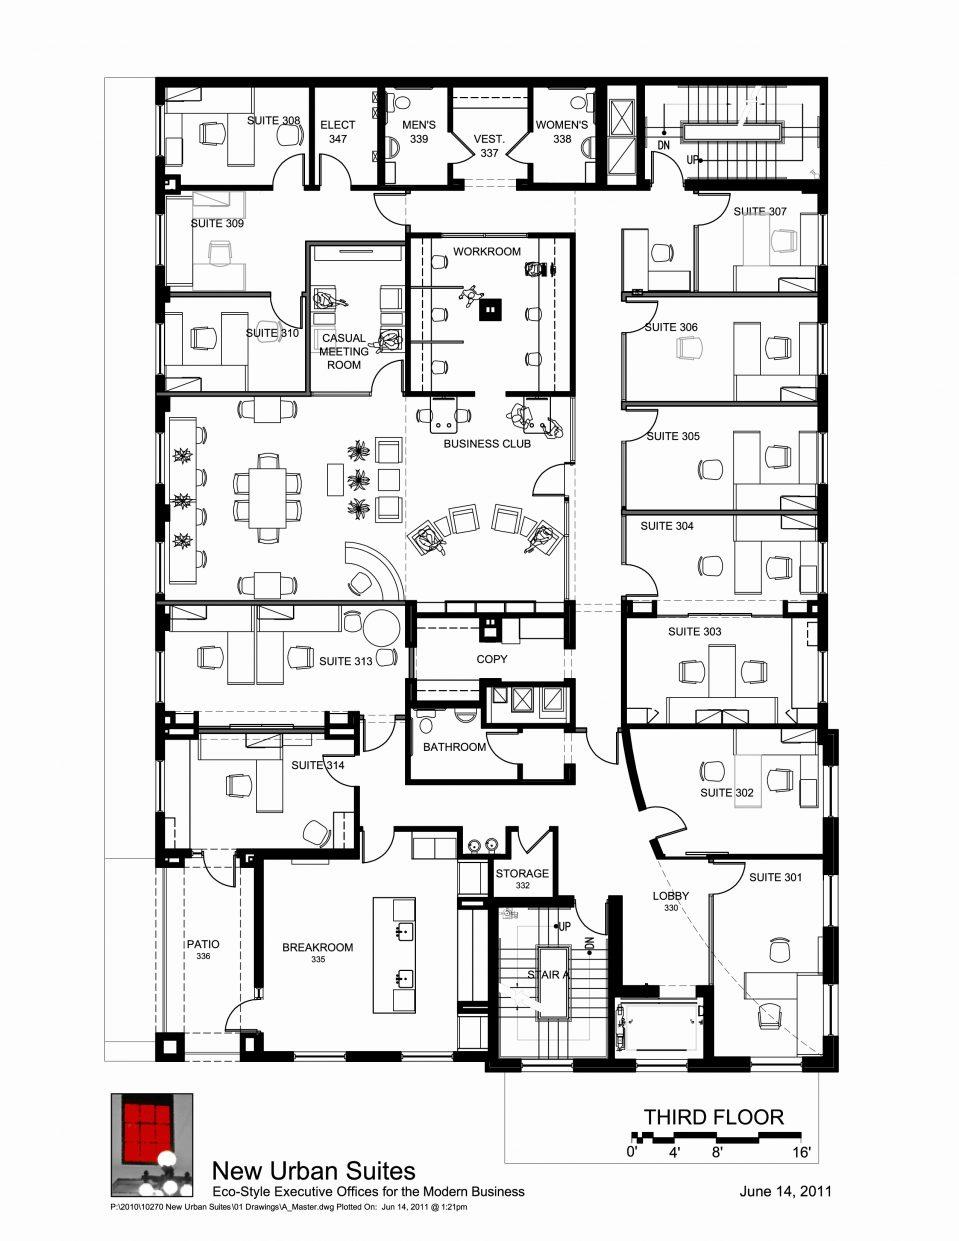 959x1241 Uncategorized Office Floor Plans With Exquisite Office Building